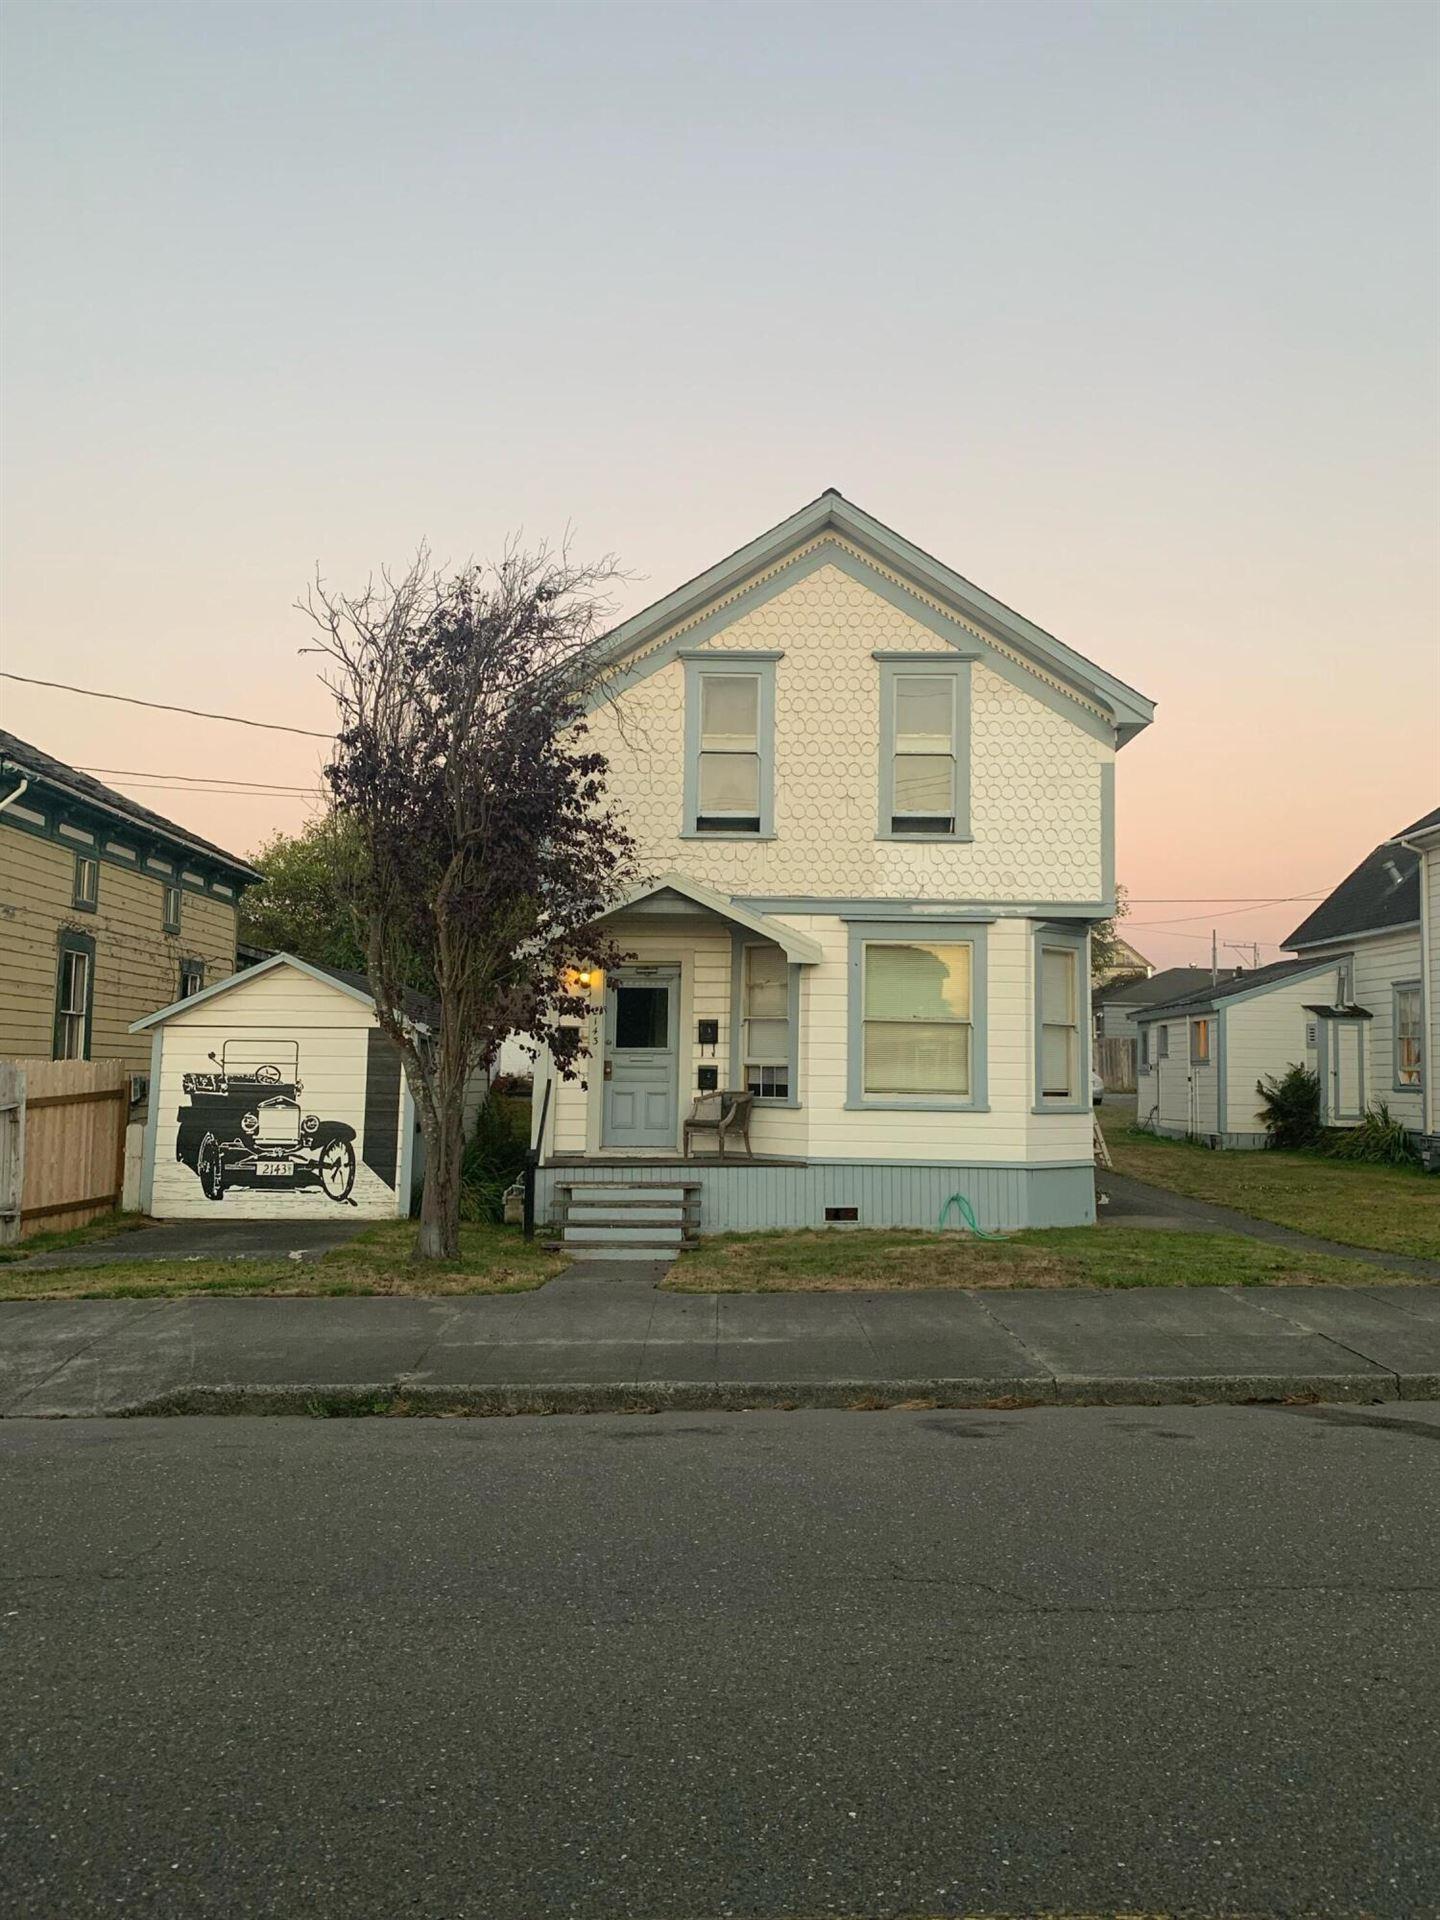 2143 California Street, Eureka, CA 95501 - MLS#: 260152